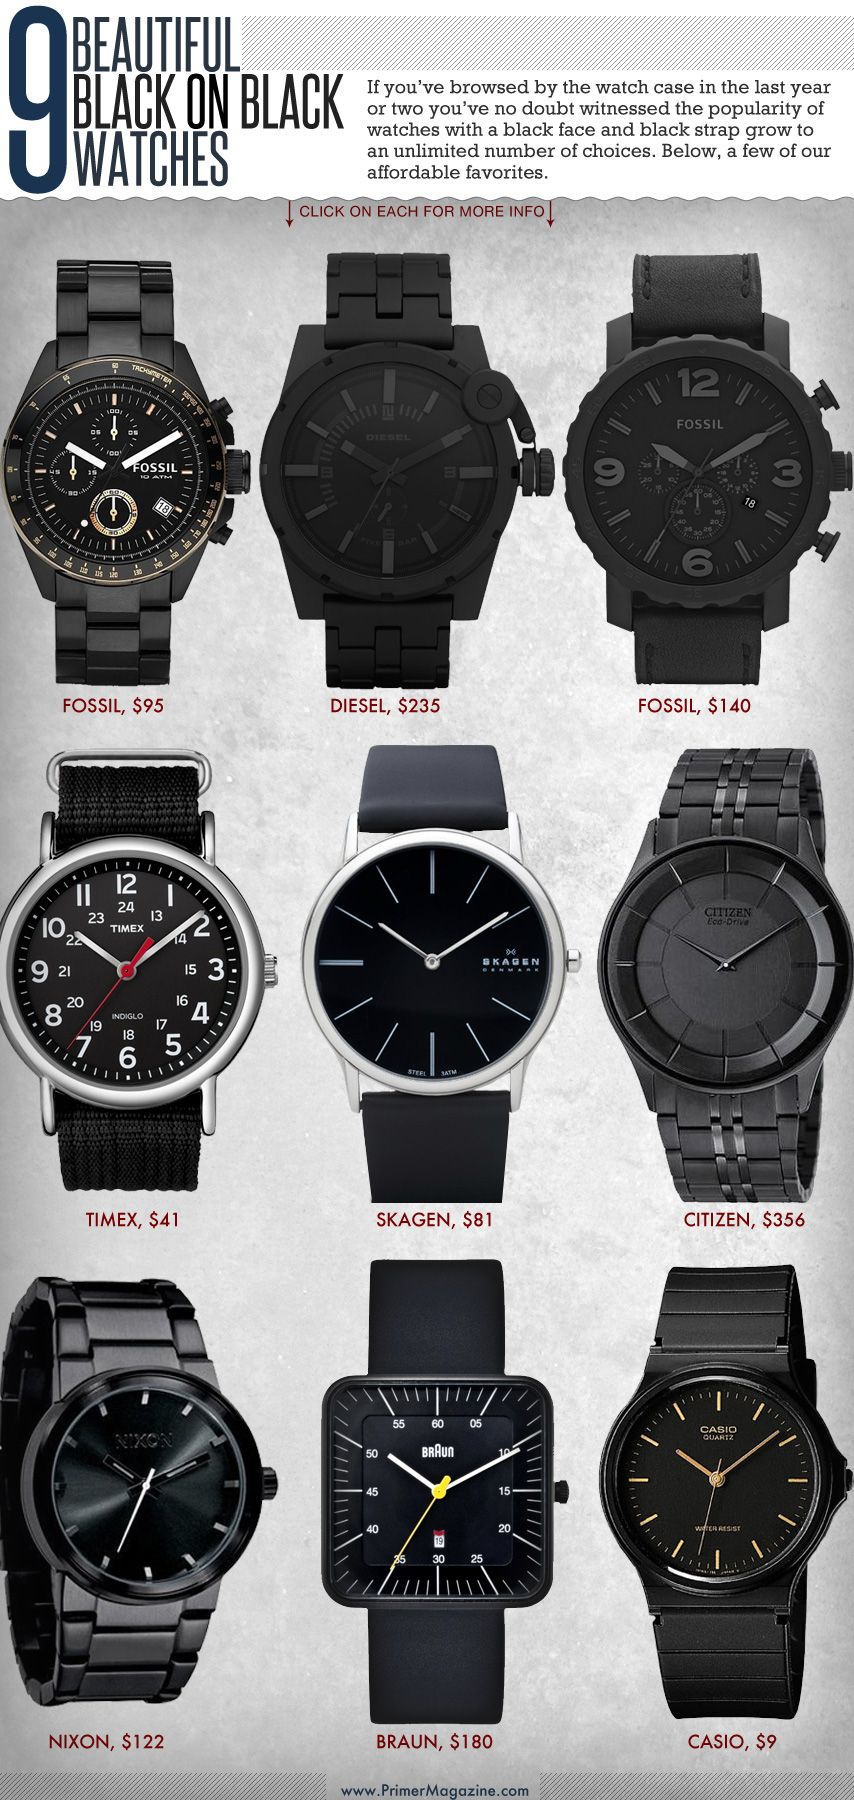 9 Beautiful Black on Black Watches | Black watch, Watches